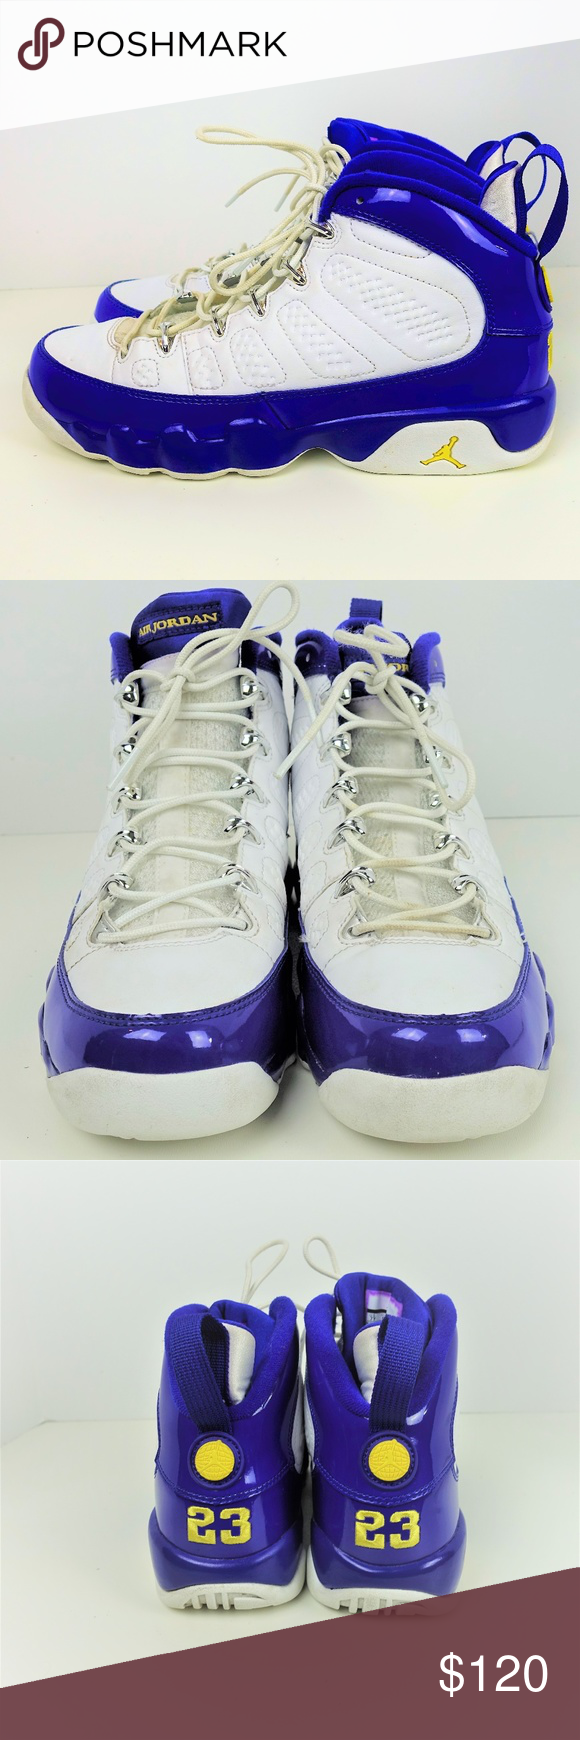 0cfa38a5b37d9 Nike Air Jordan Retro IX 9 Kobe Bryant PE Concord Nike Air Jordan Retro IX  9 Kobe Bryant PE Concord Purple White Yellow Size 7 Box is included No  rips